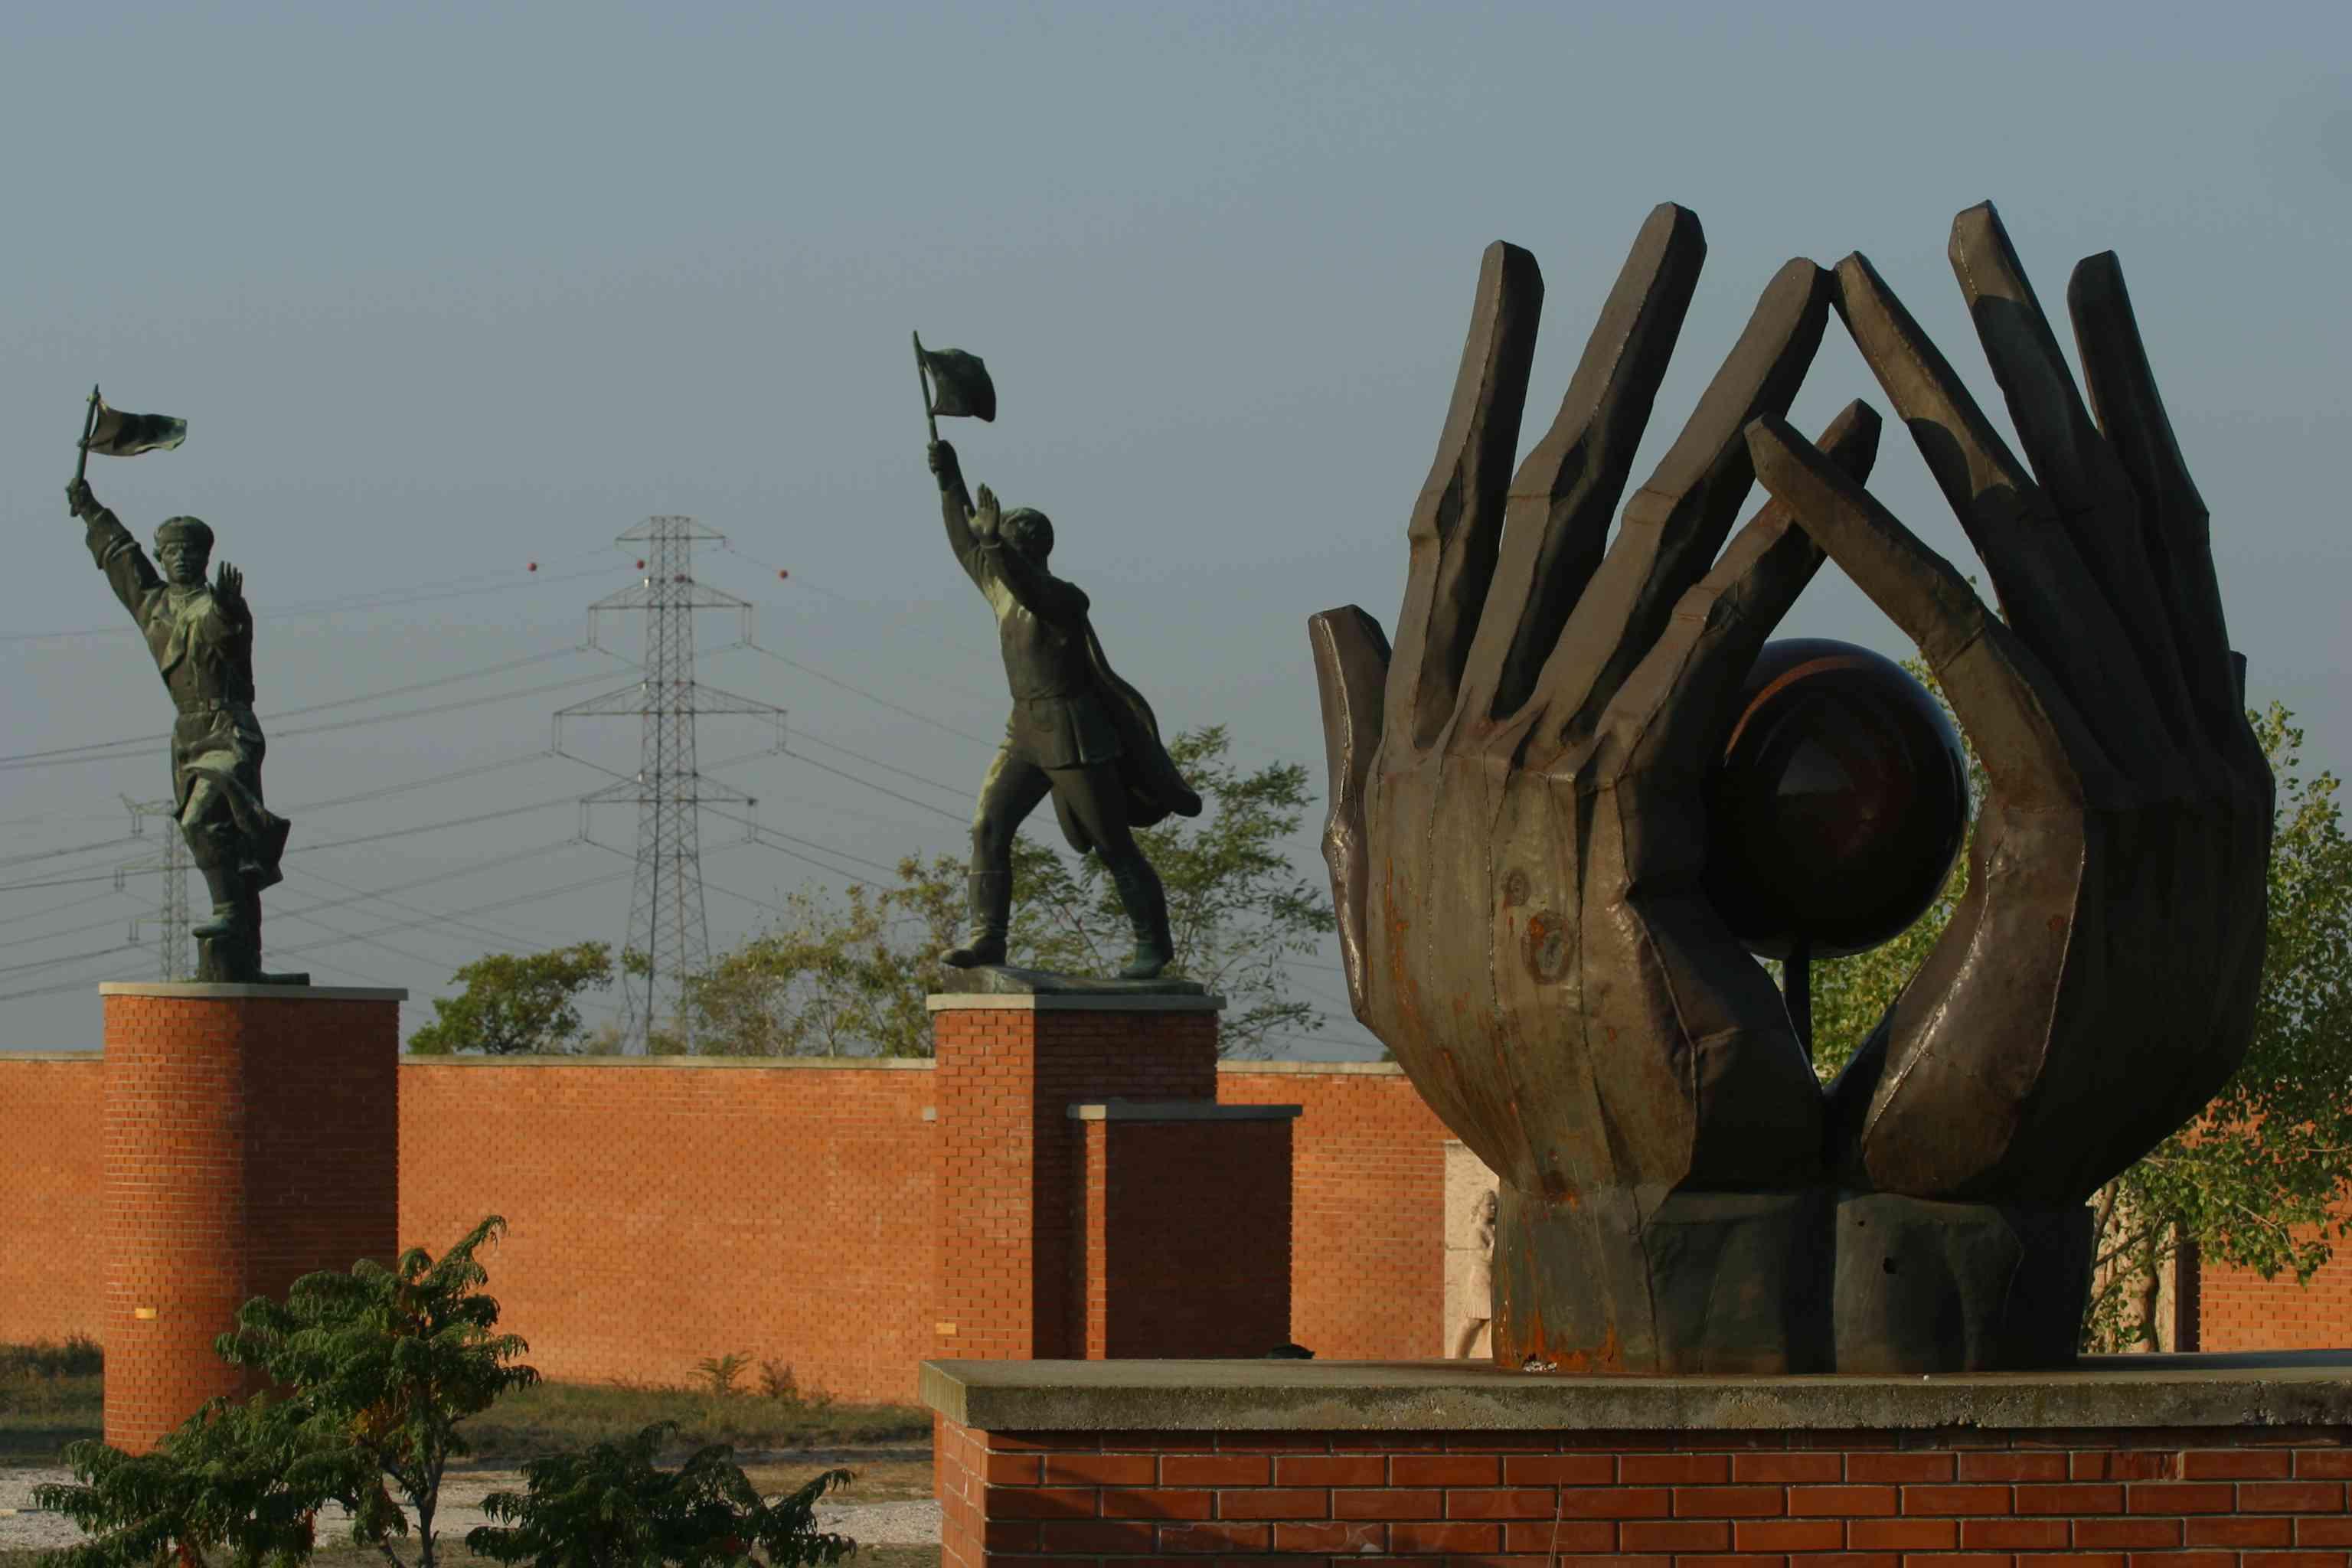 statues in Memento Park